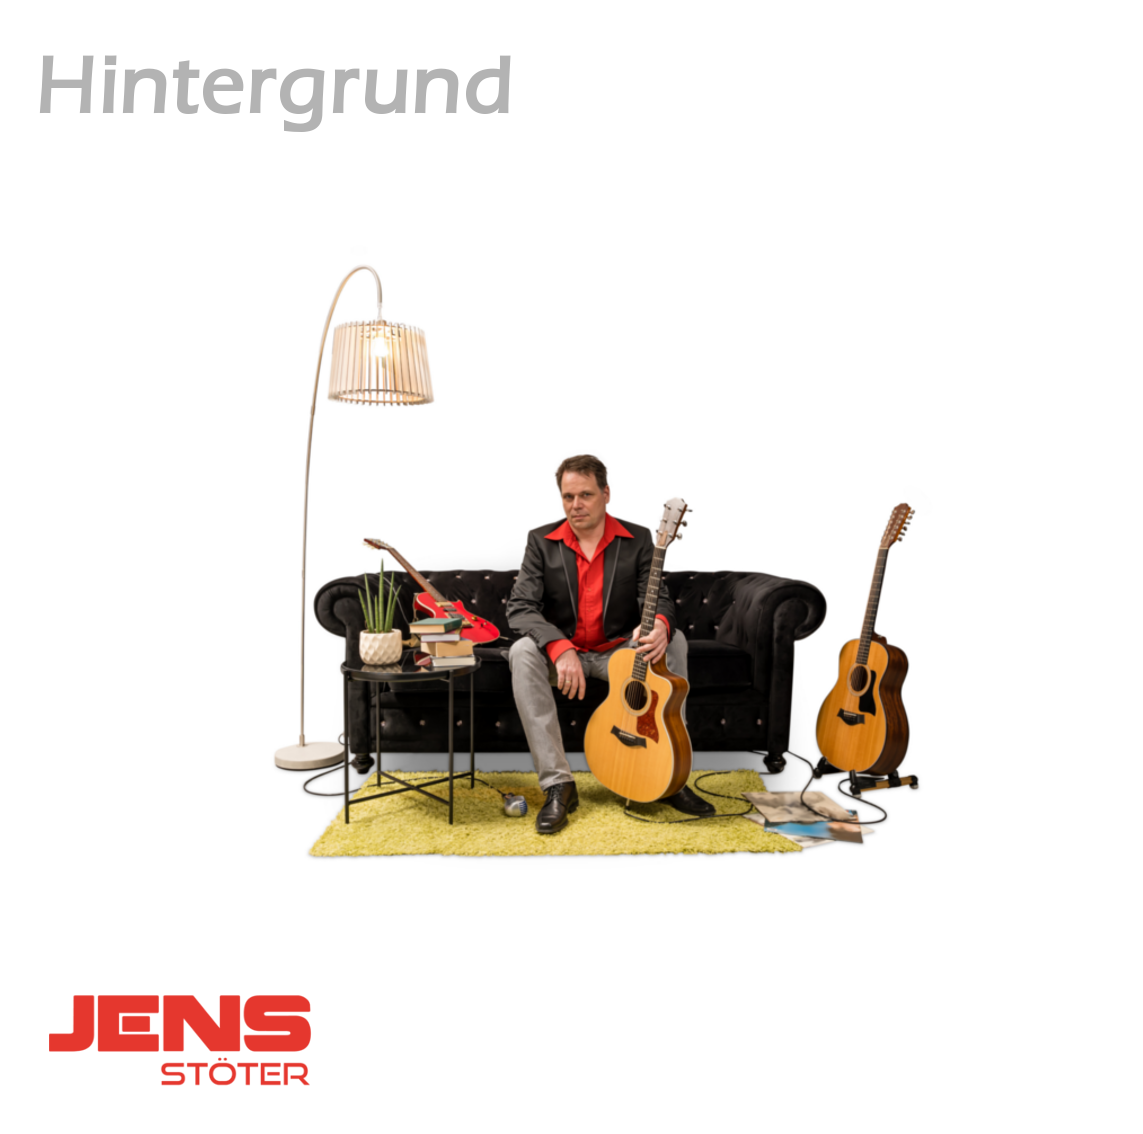 Hintergrund - Jens Stöter